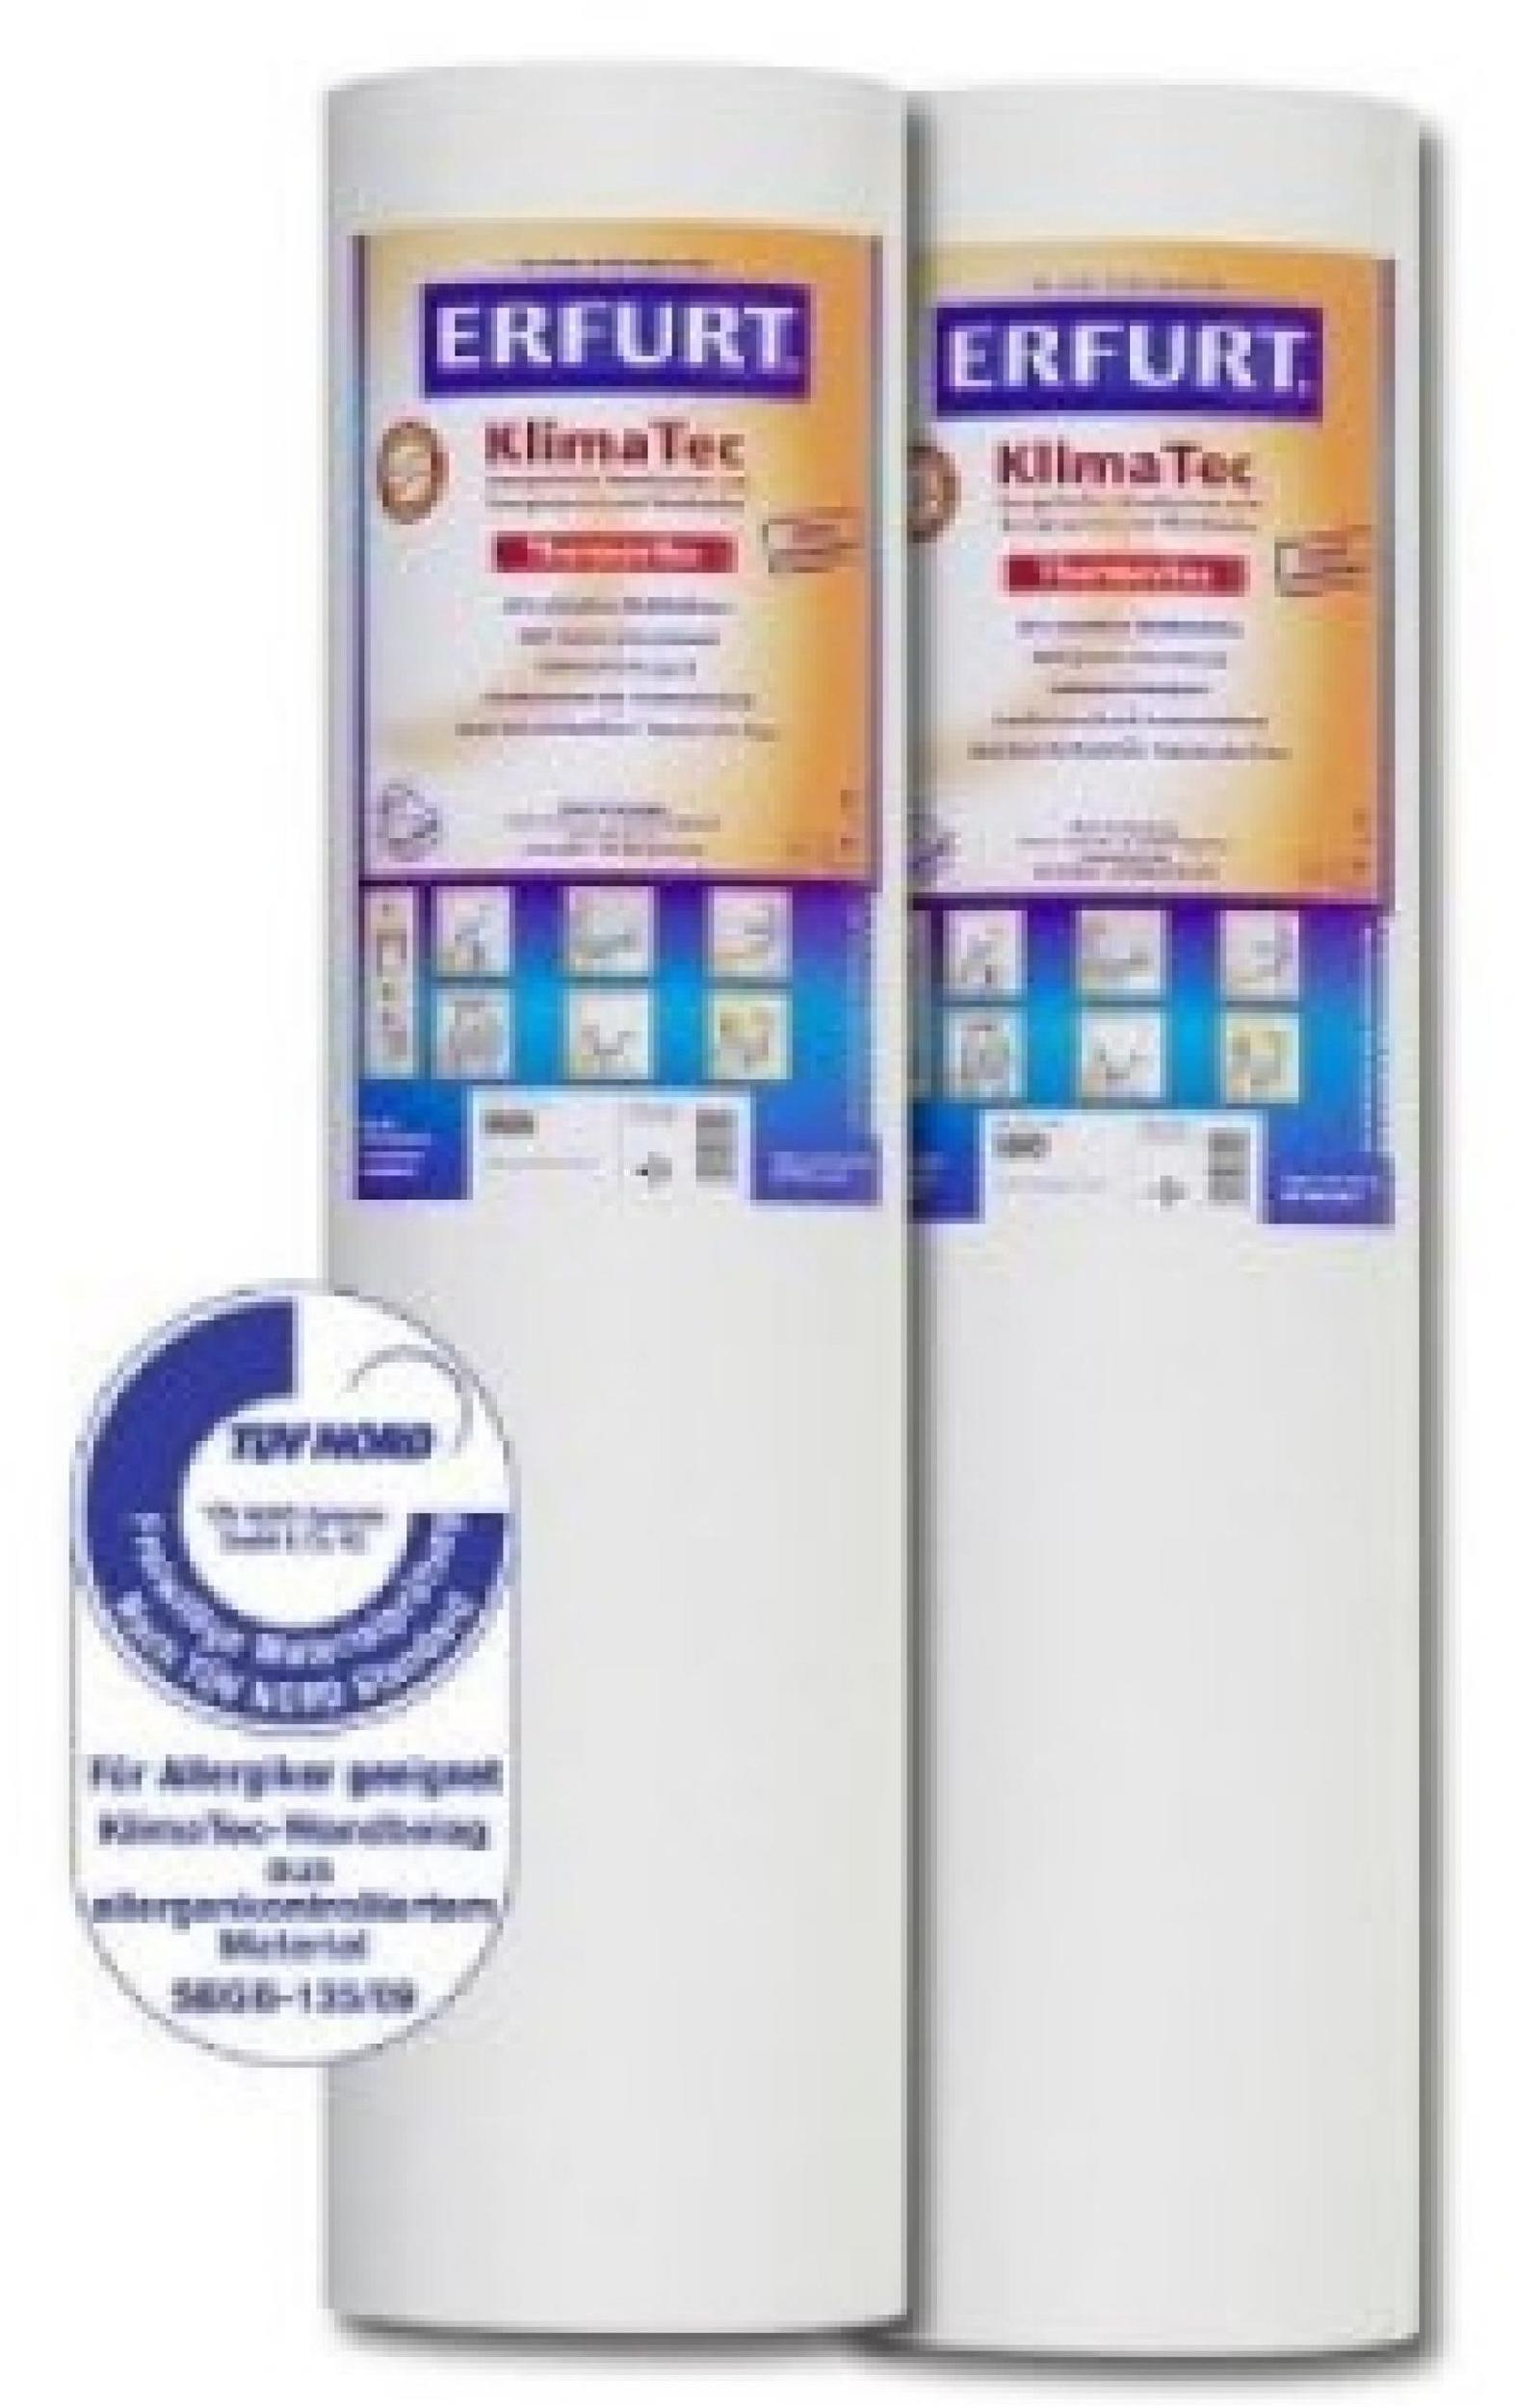 erfurt klimatec thermovlies premium (10m x 0,75m) preisvergleich ab